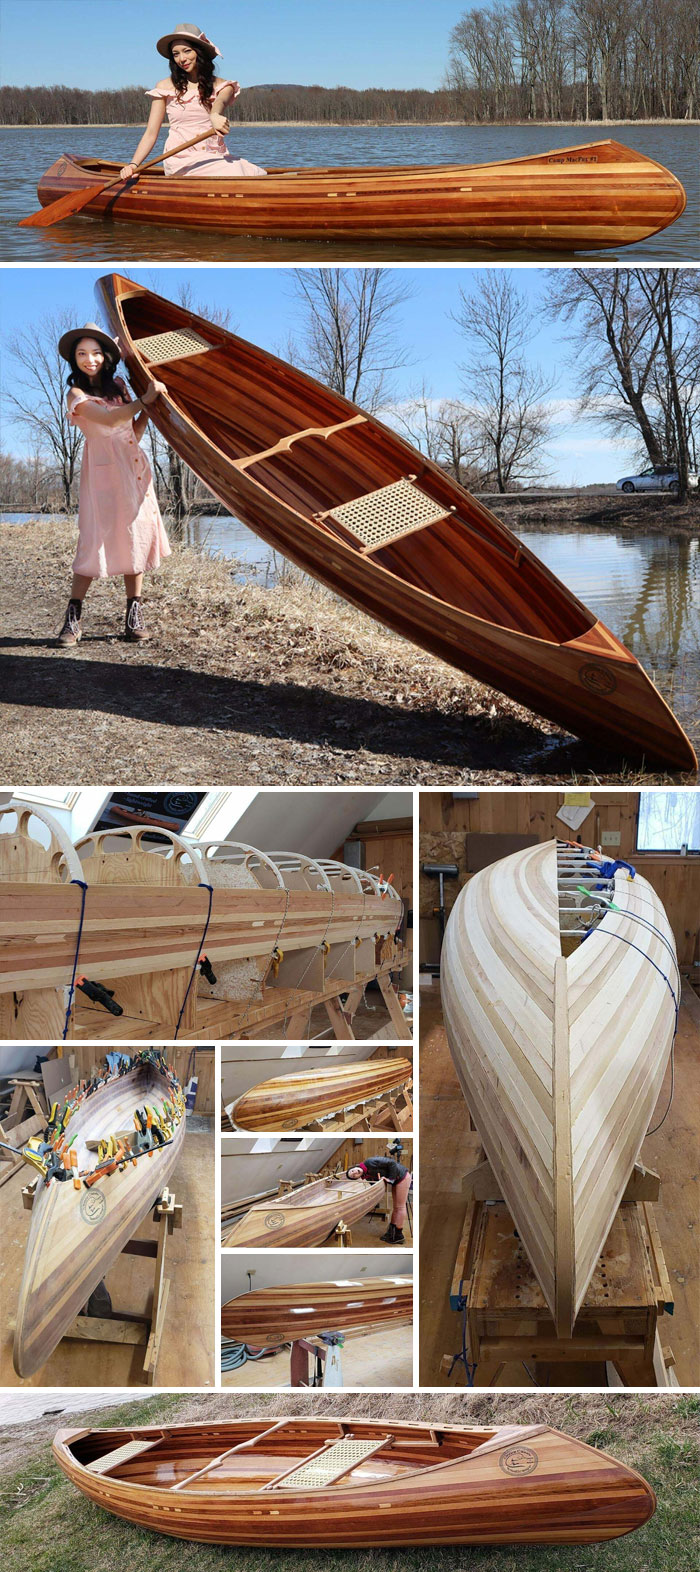 Viaje inaugural de mi primera canoa de listones de cedro sin kit, sin planos, sin grapas